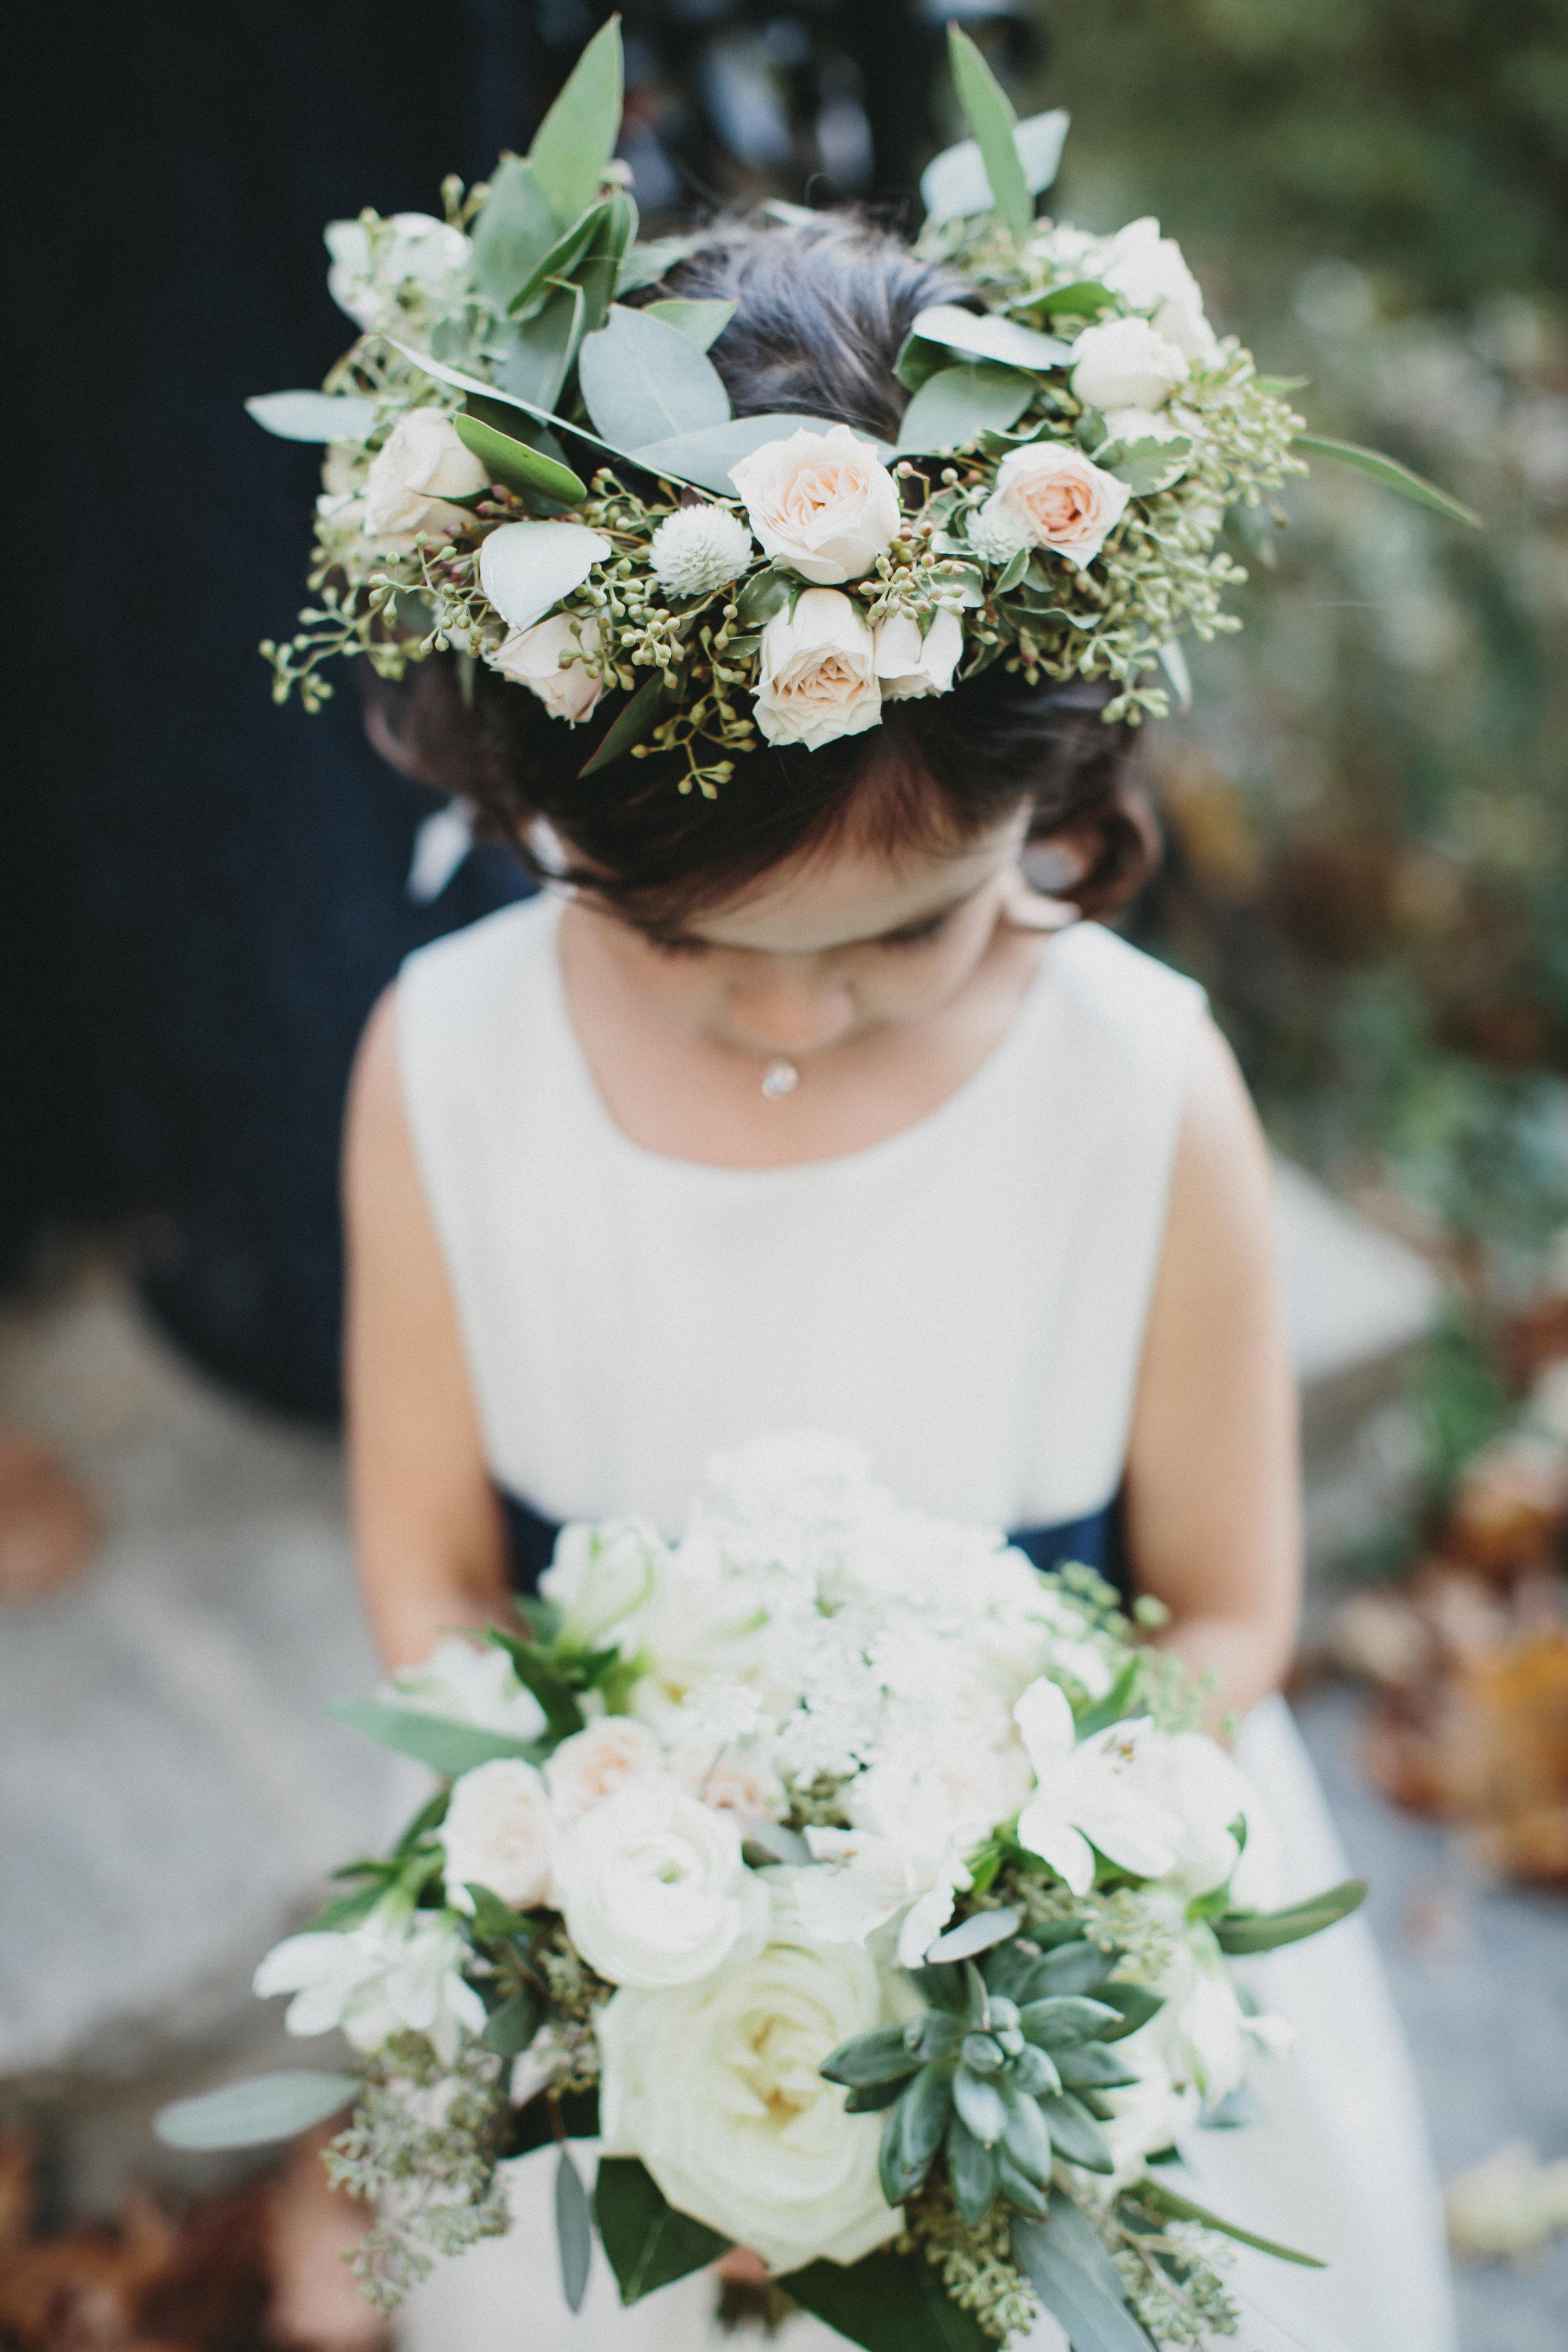 A Little Flower Crown